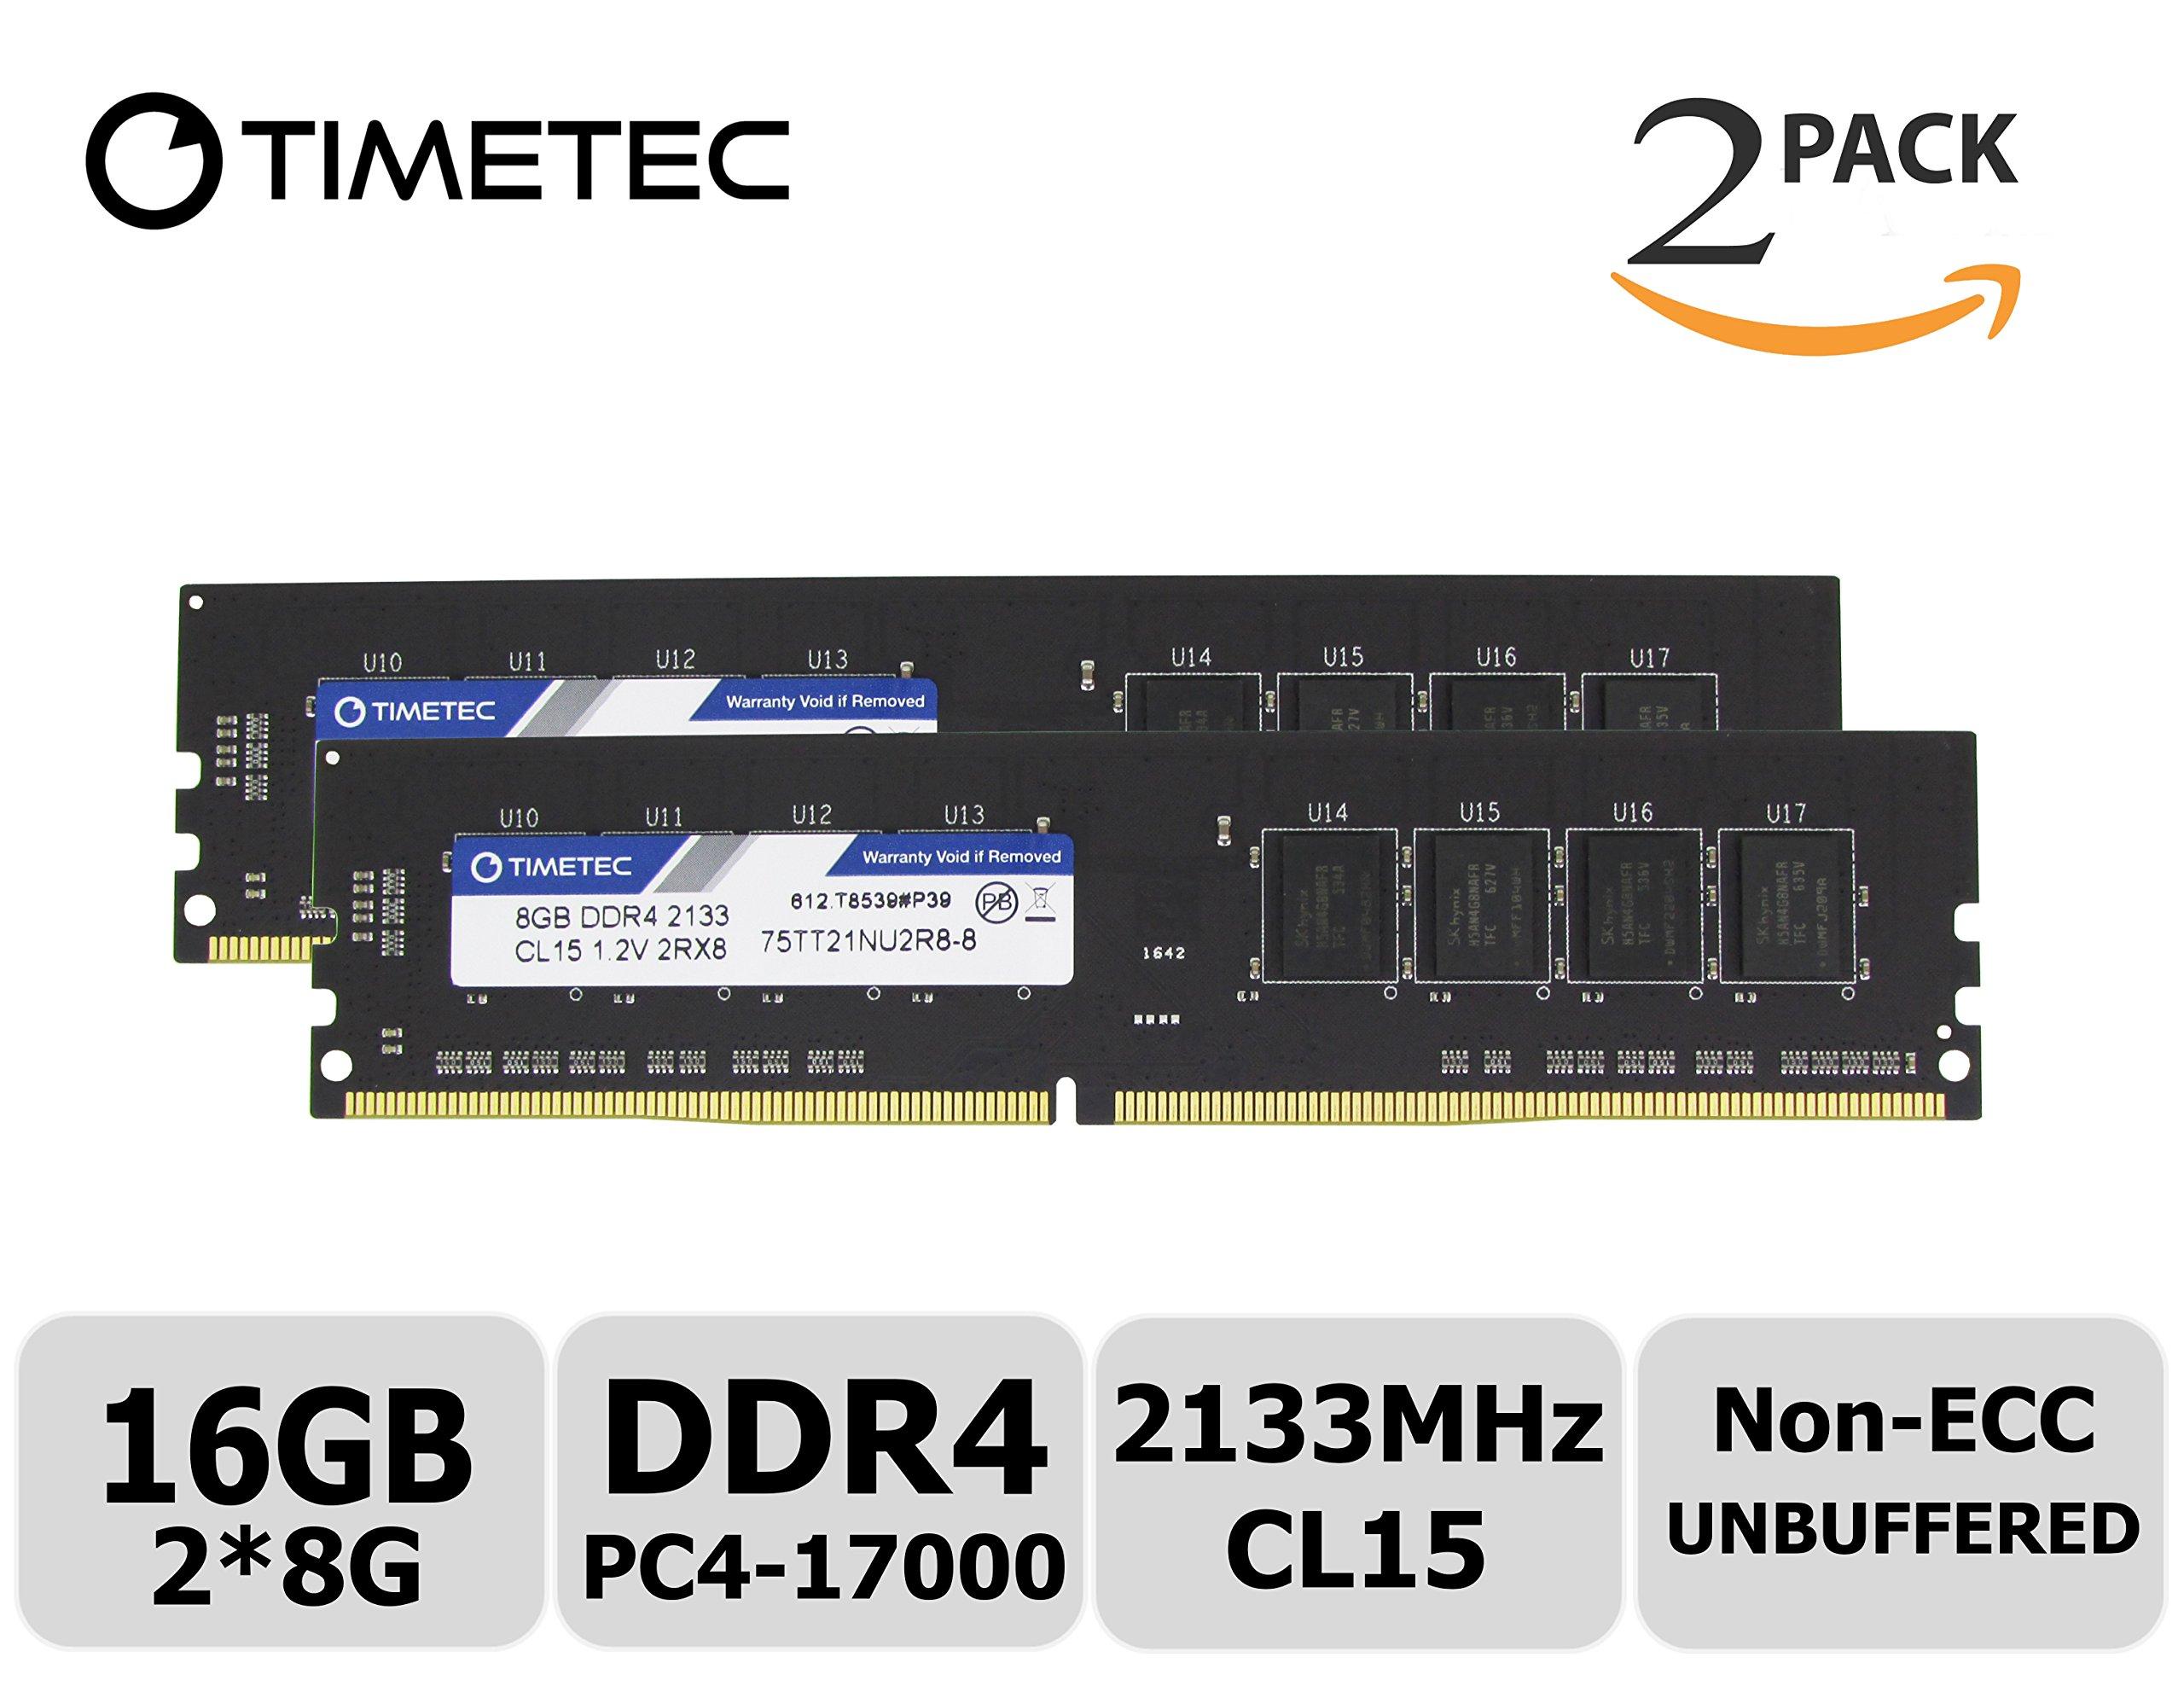 Timetec Hynix IC 16GB KIT(2x8GB) DDR4 2133MHz PC4-17000 Non ECC Unbuffered 1.2V CL15 2Rx8 Dual Rank 288-Pin UDIMM Desktop PC Computer Memory Ram Module Upgrade (16GB KIT (2x8GB))